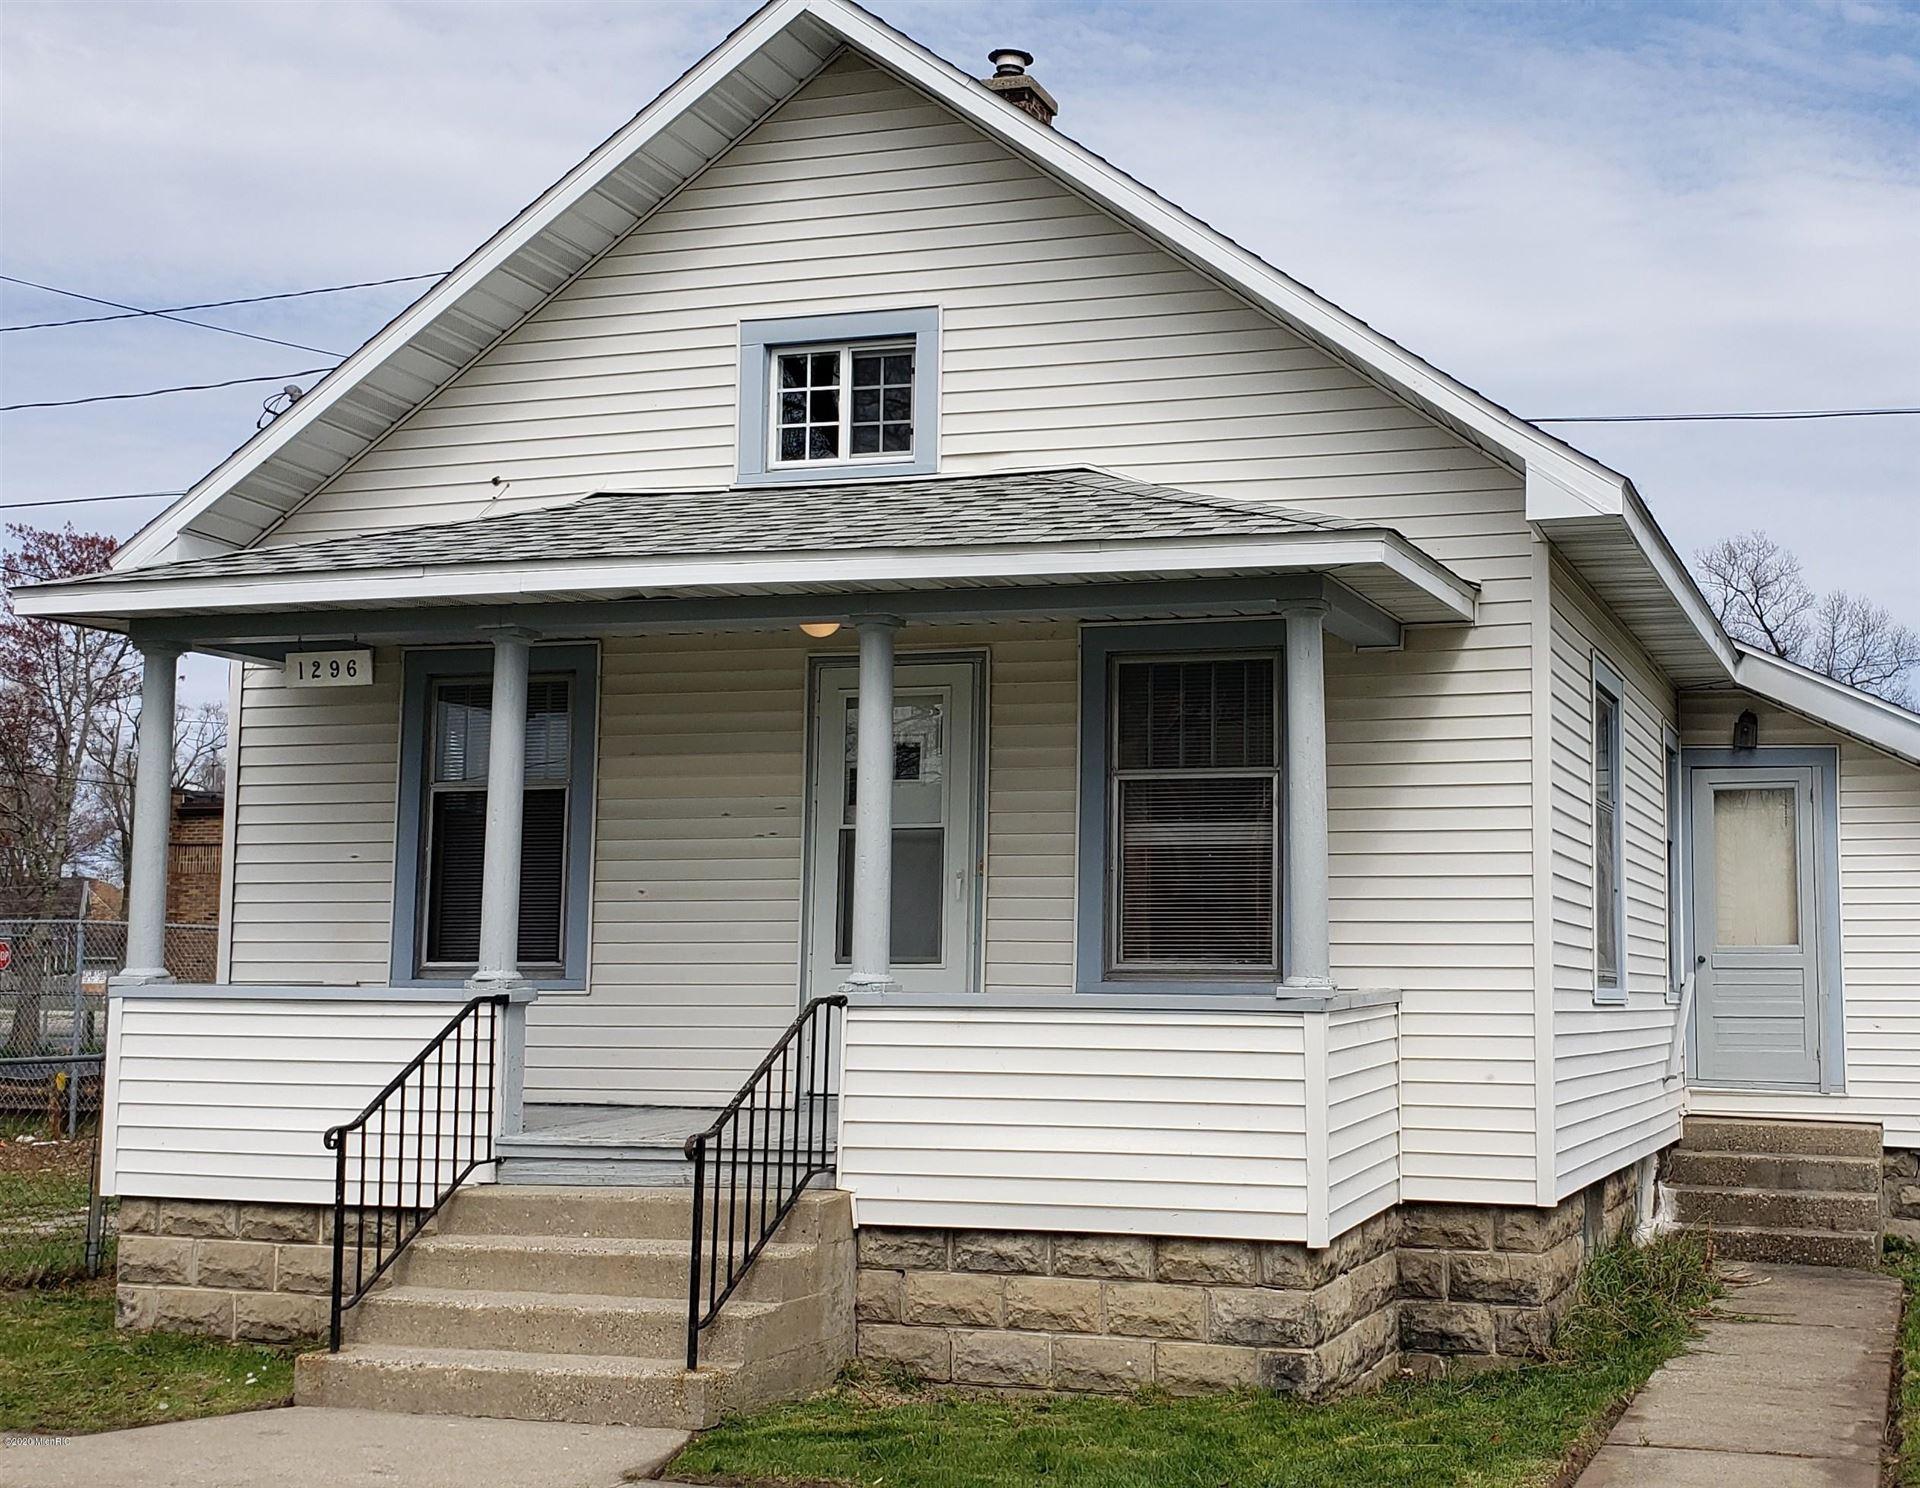 1296 Sanford Street, Muskegon, MI 49441 - MLS#: 20014426